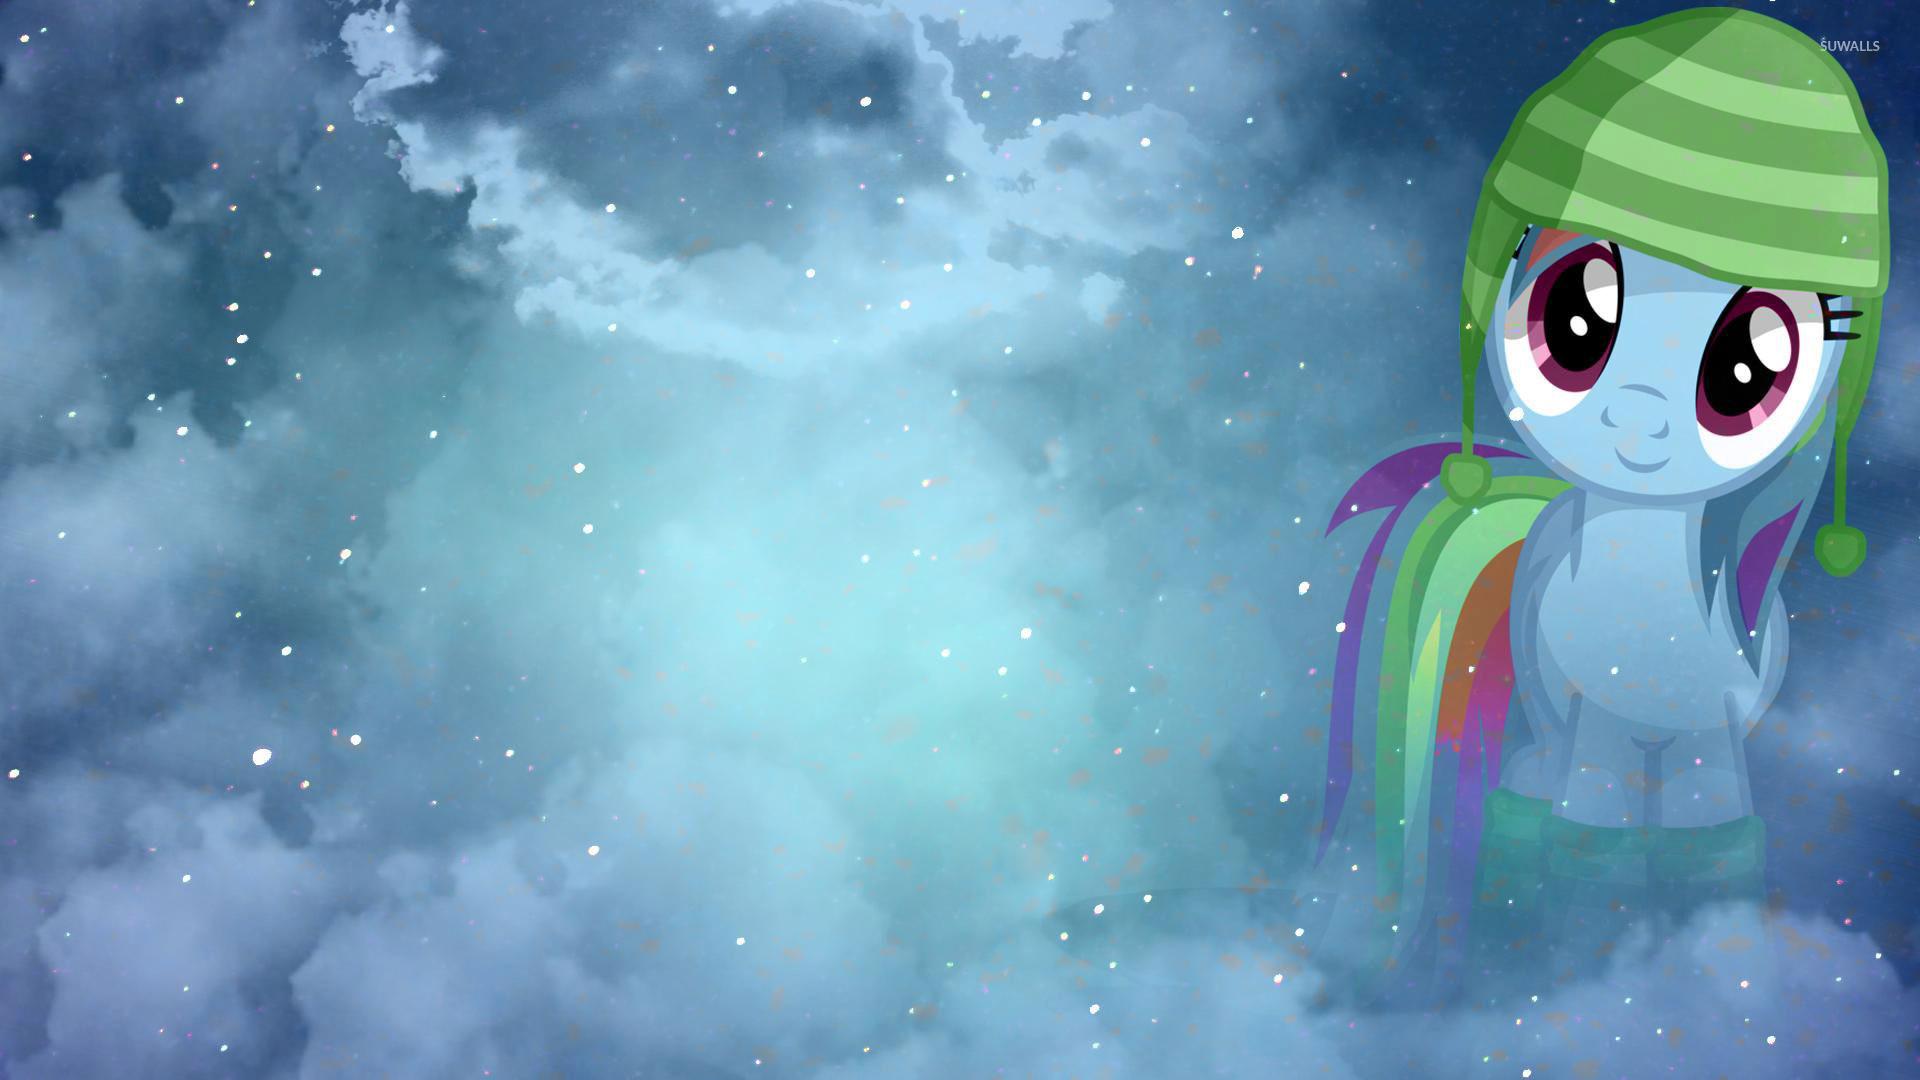 Rainbow Dash – My Little Pony Friendship is Magic [7] wallpaper  jpg